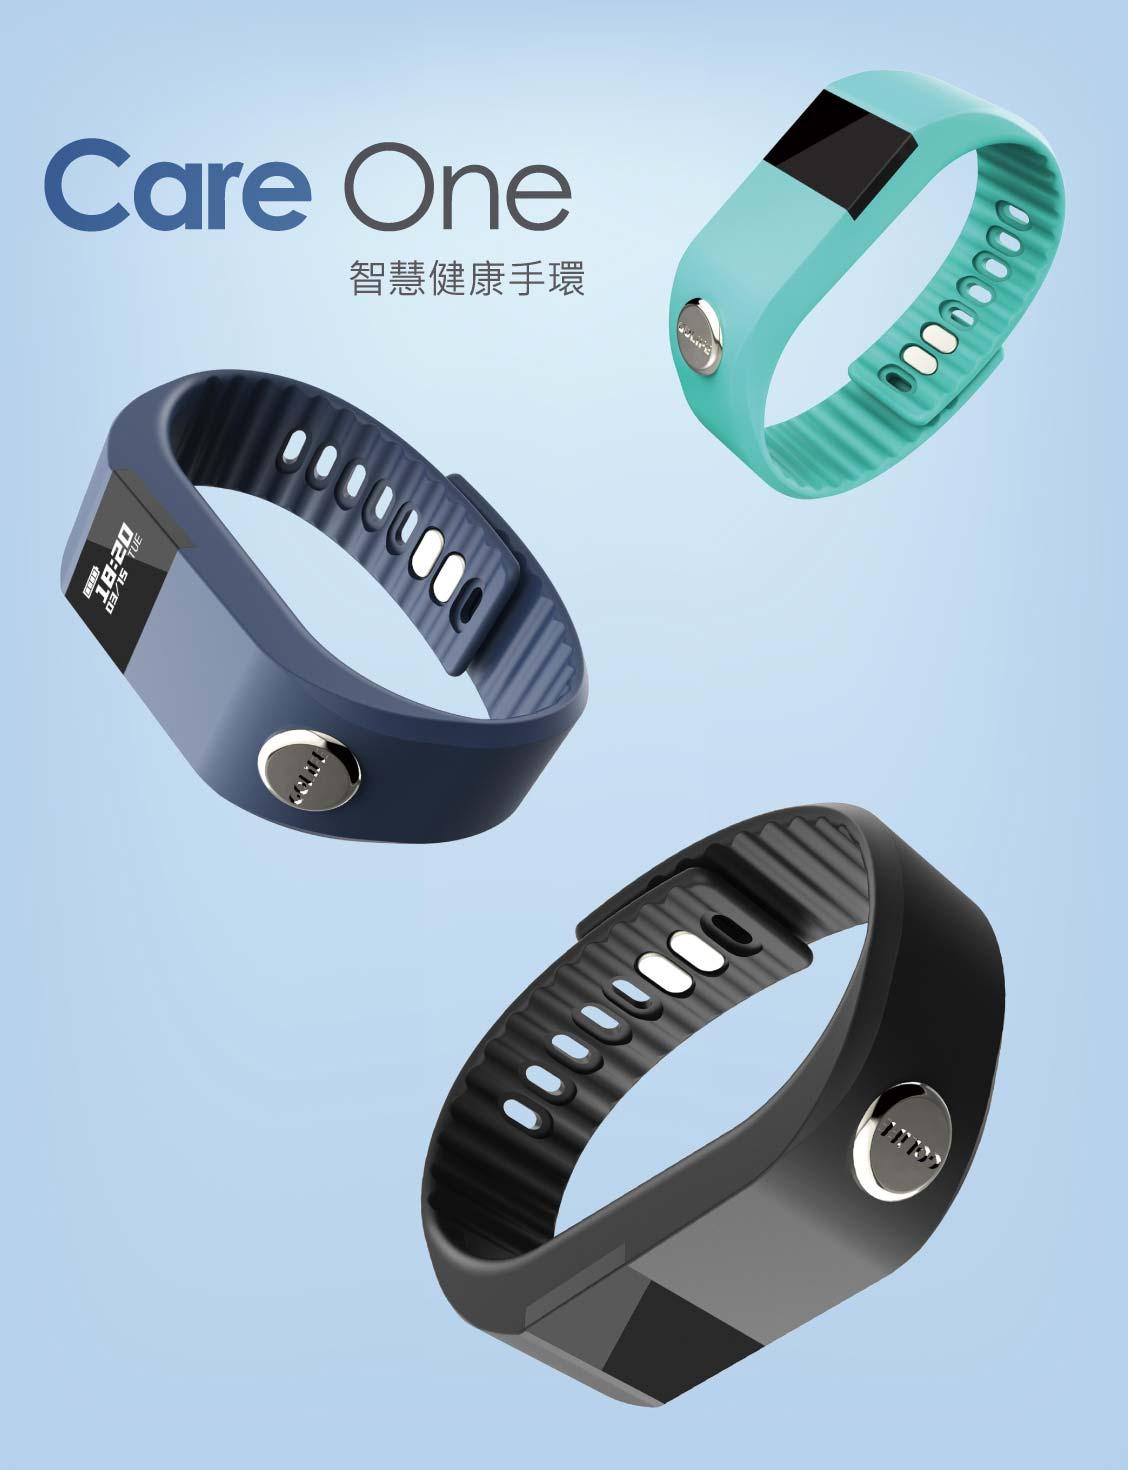 Care One 智慧健康手環